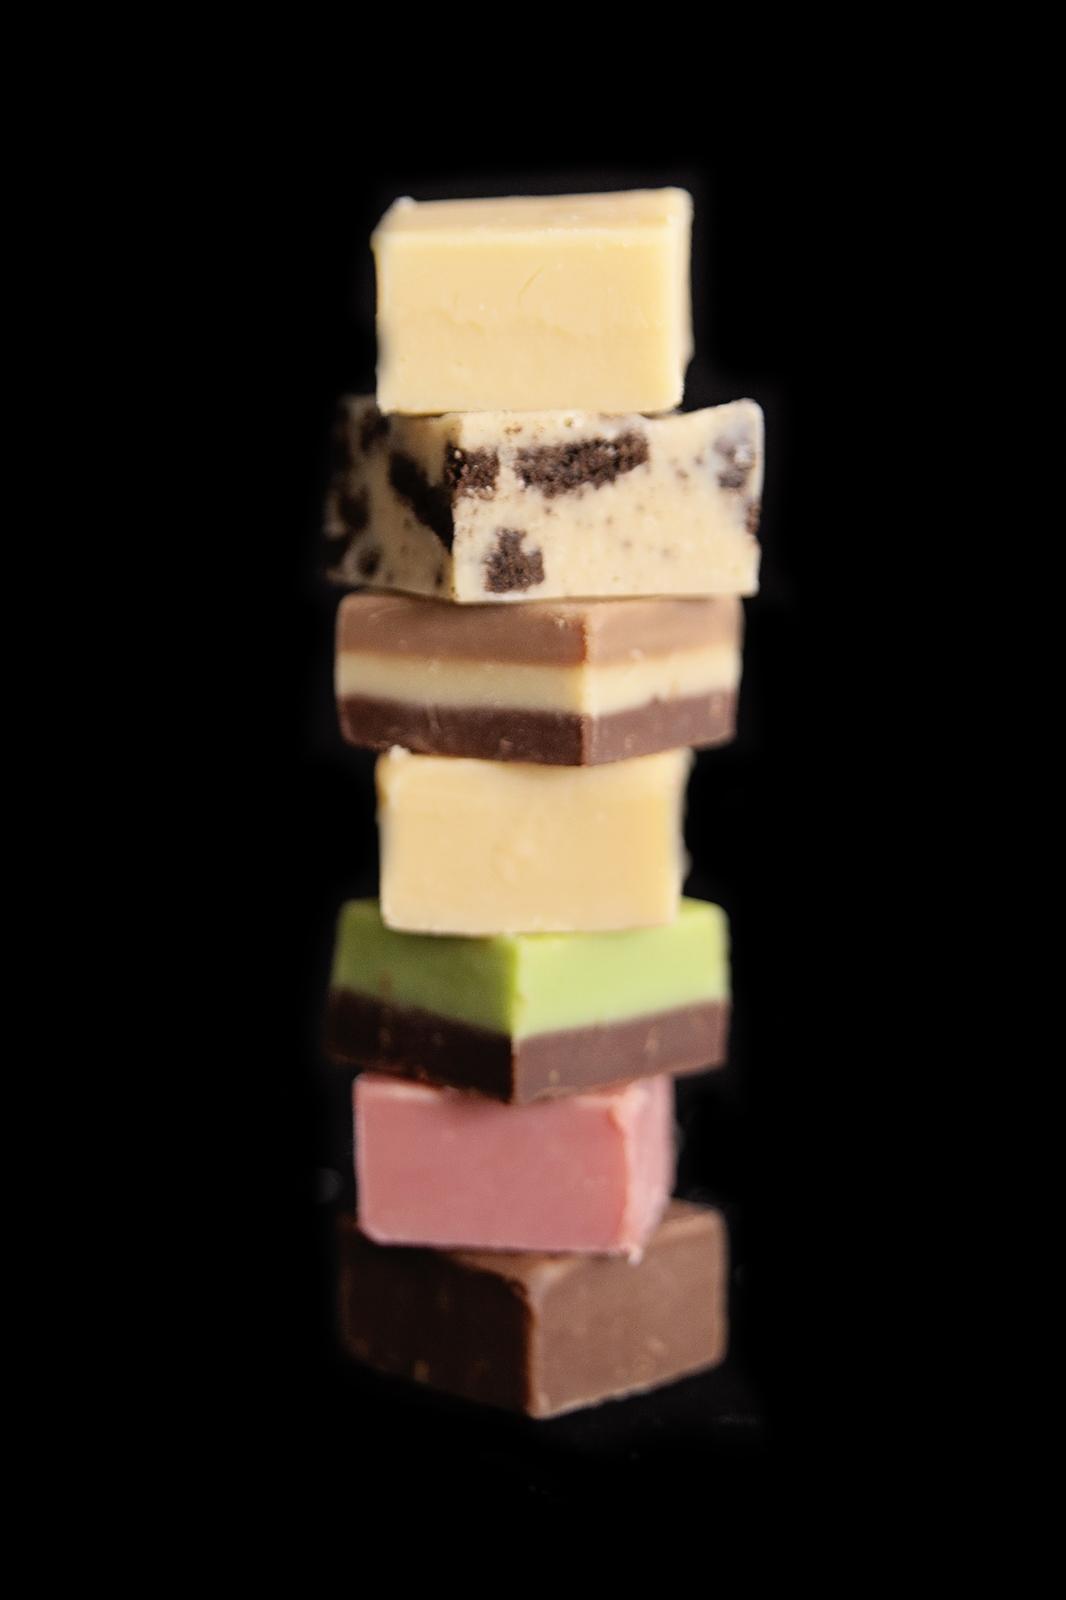 Variety of Fudge